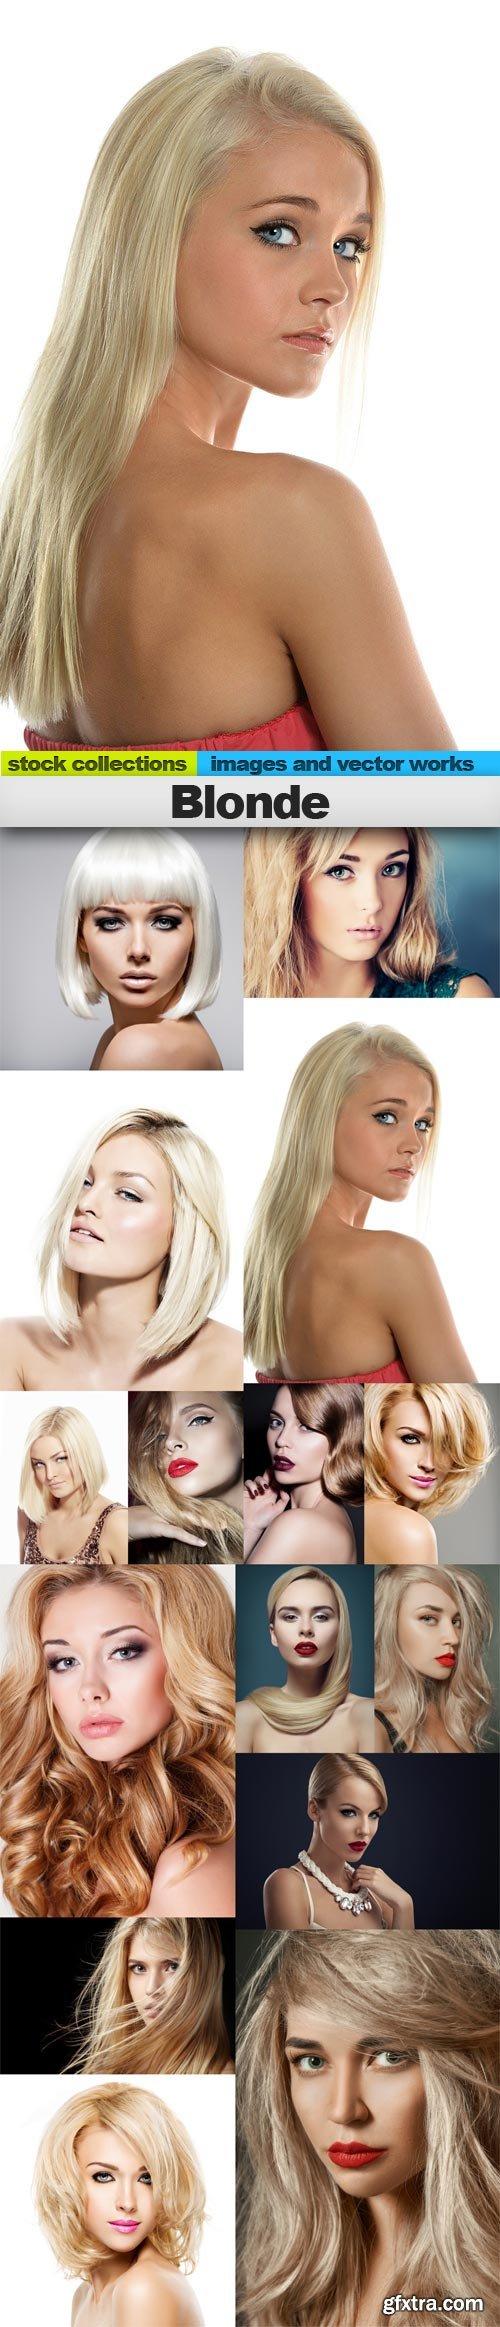 Blonde, 15 x UHQ JPEG